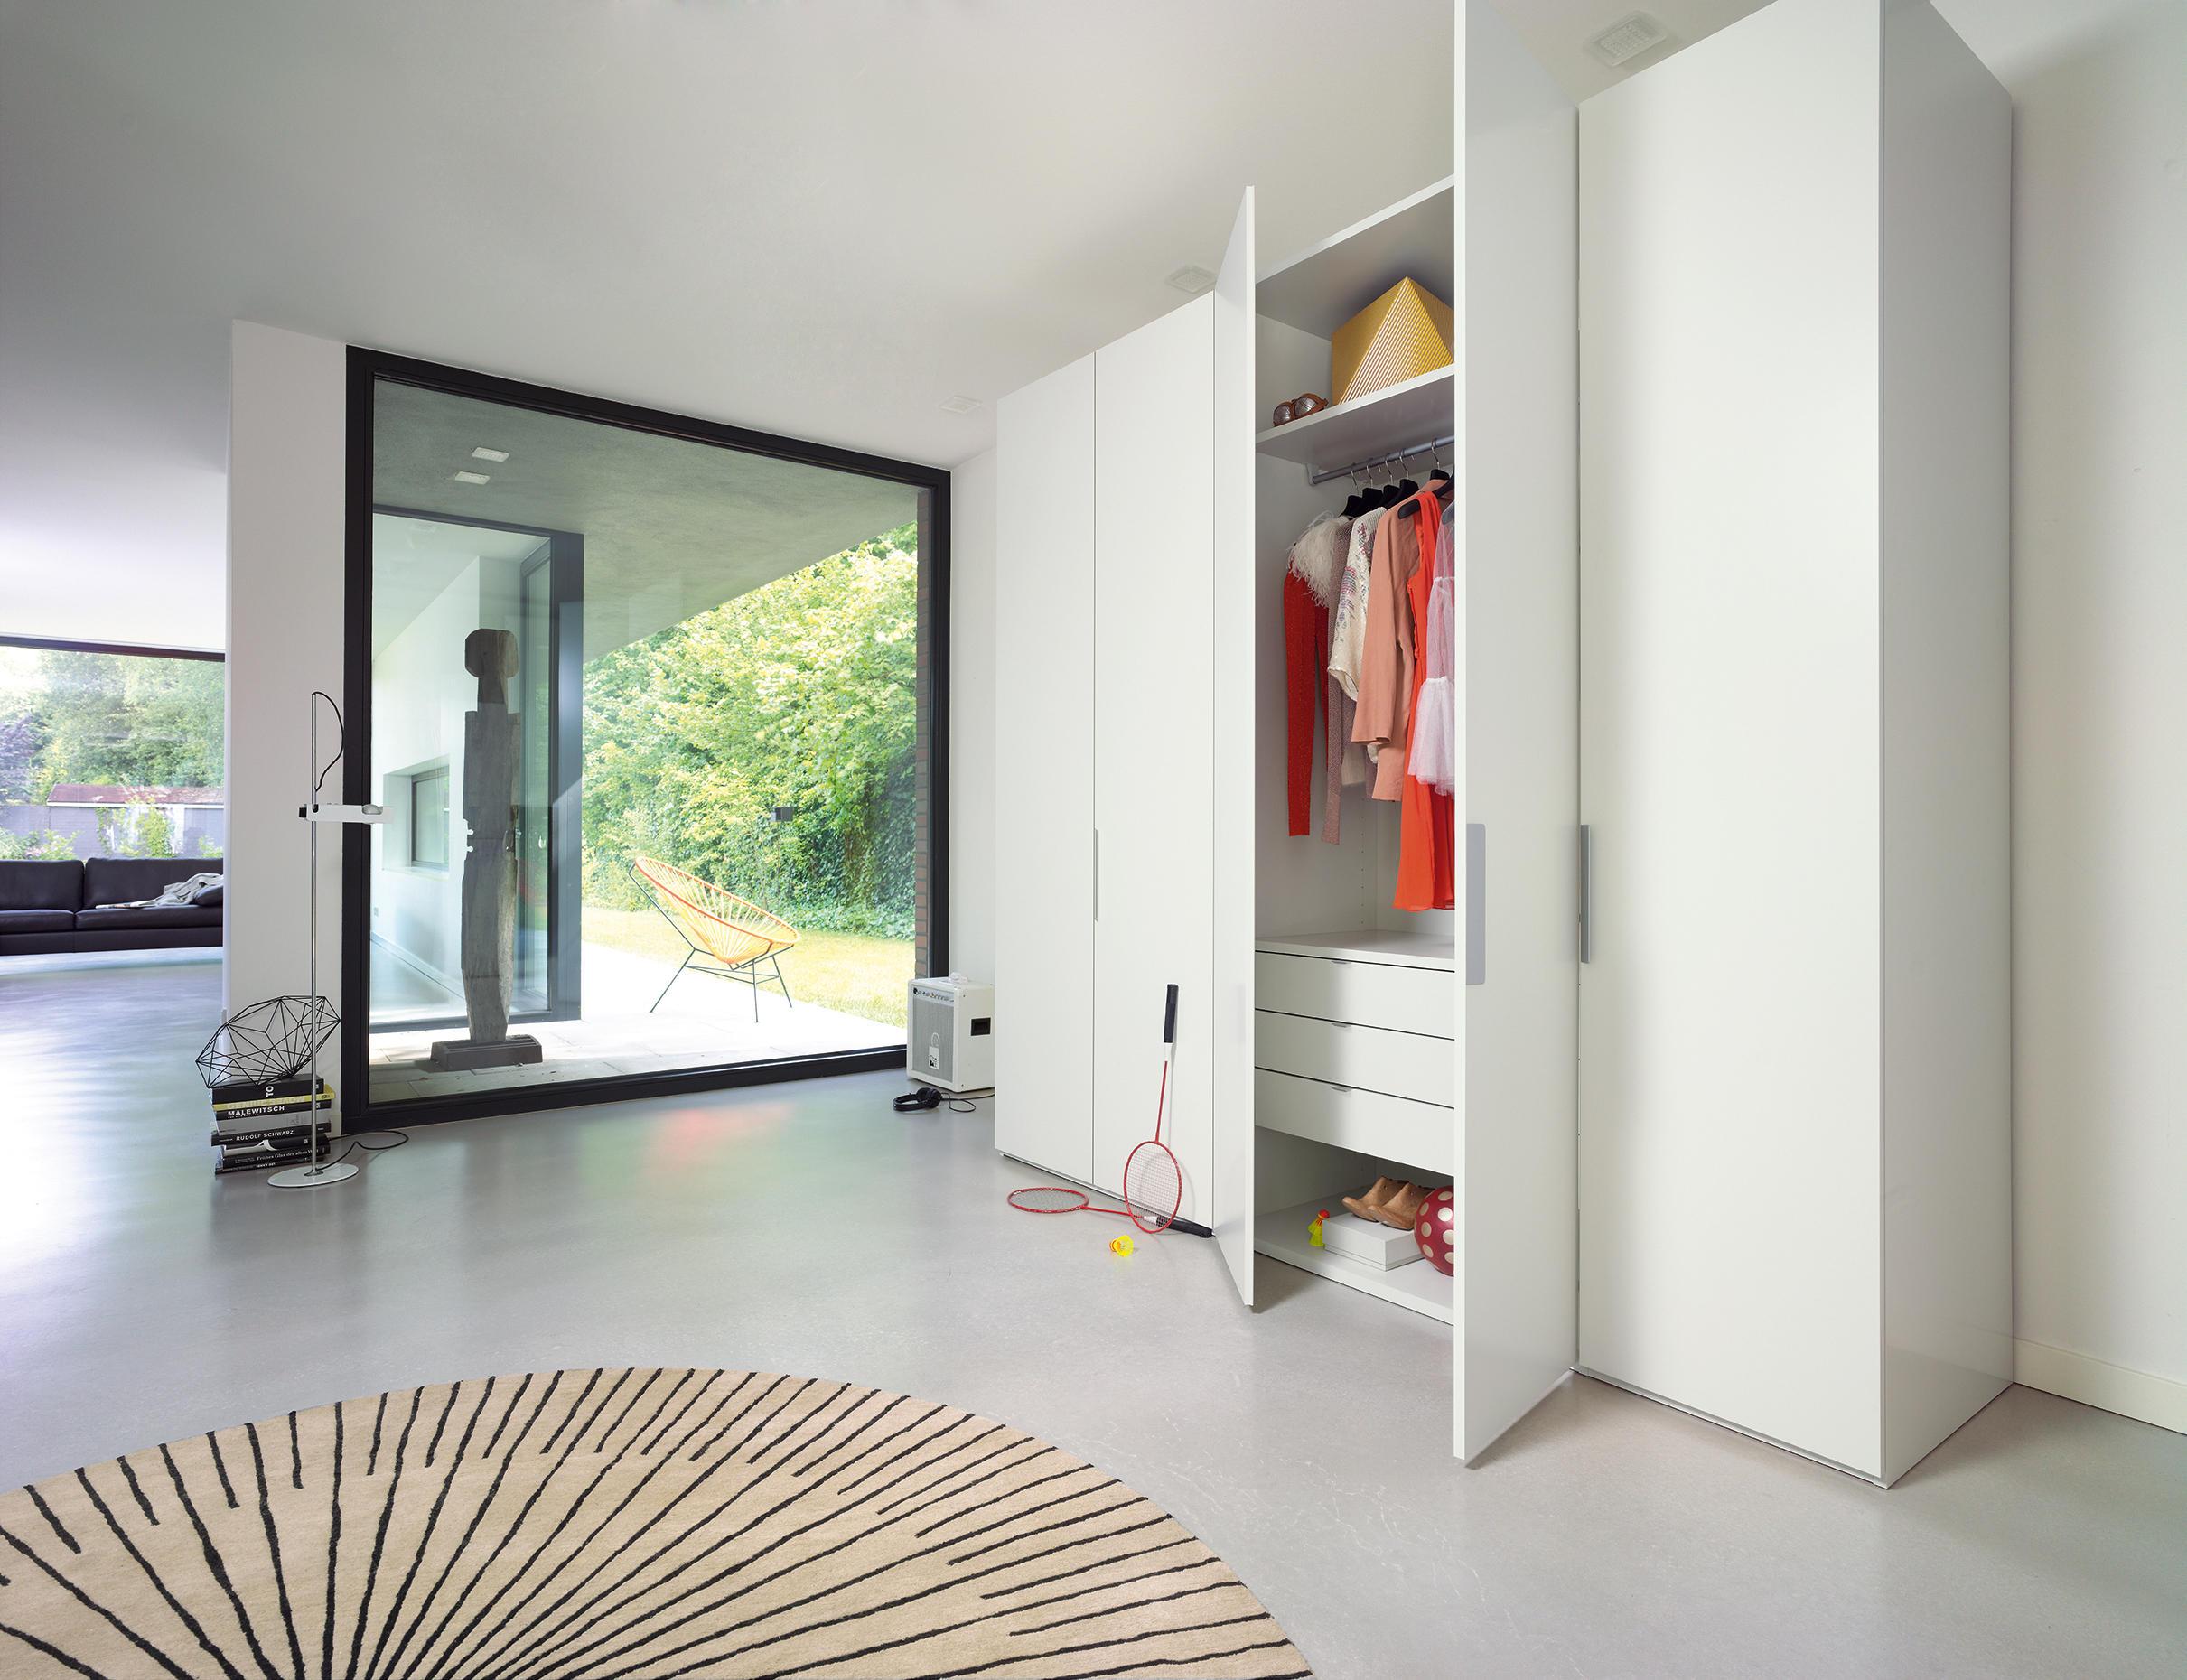 stunning moderne doppelbett ideen 36 designer betten markanten ... - Moderne Doppelbett Ideen 36 Designer Betten Markanten Namen